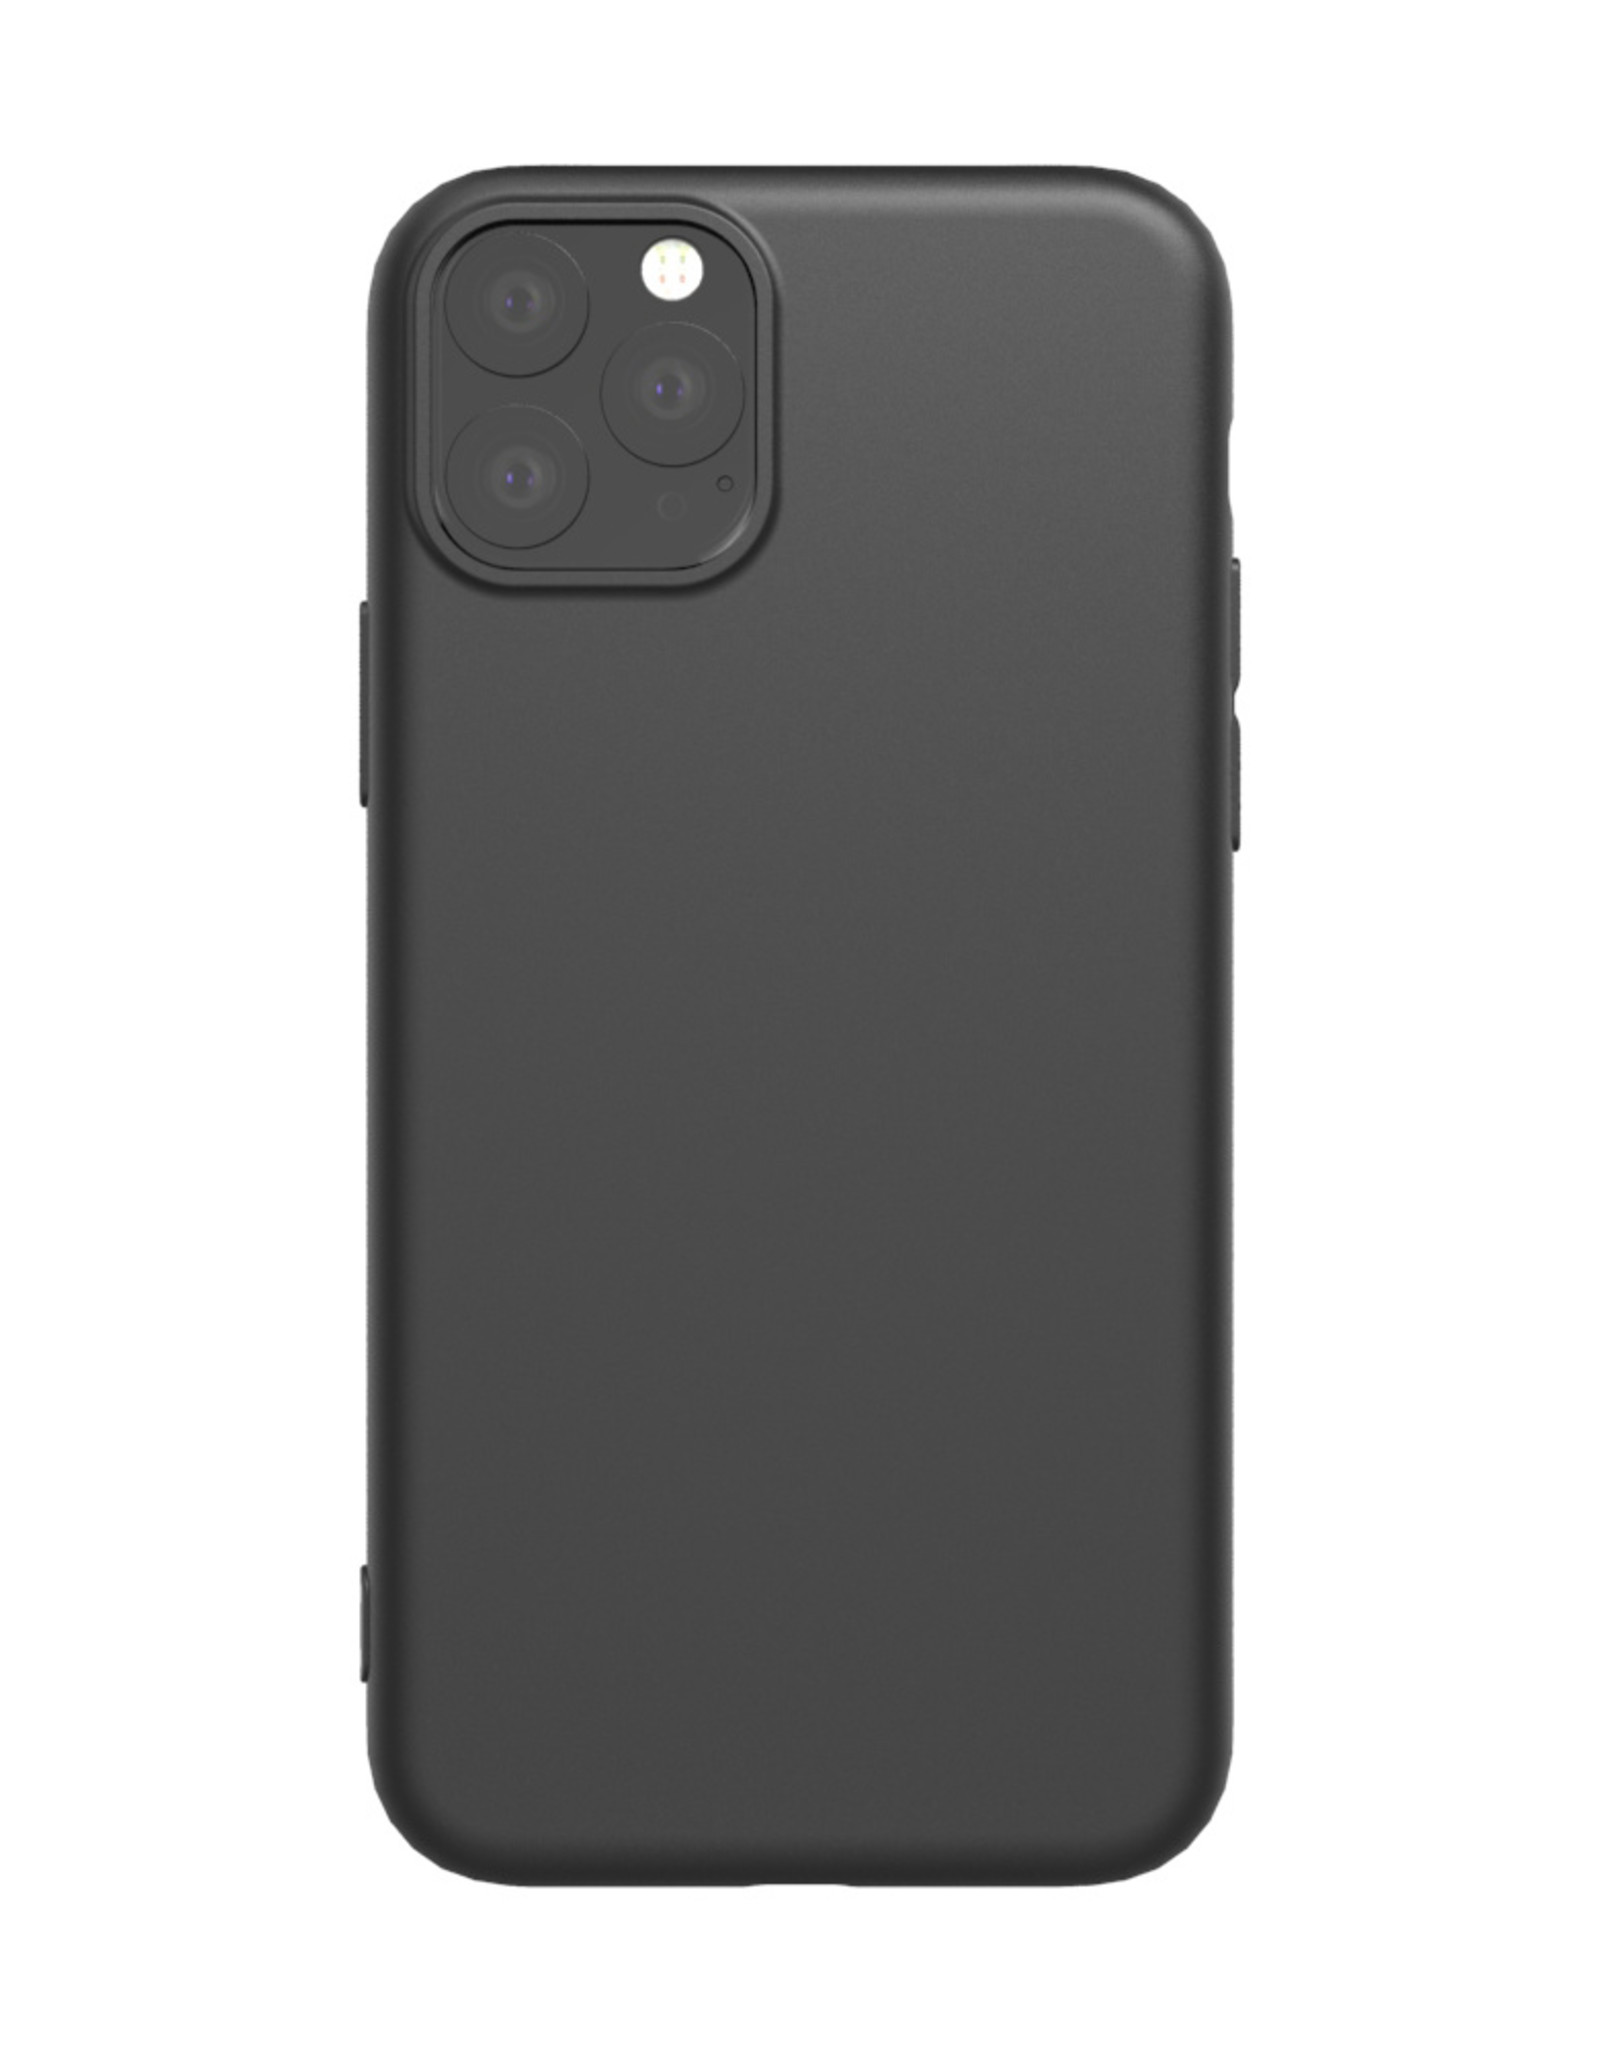 Blu Element Blu Element | Gel Skin Case Black for iPhone 11 120-2133